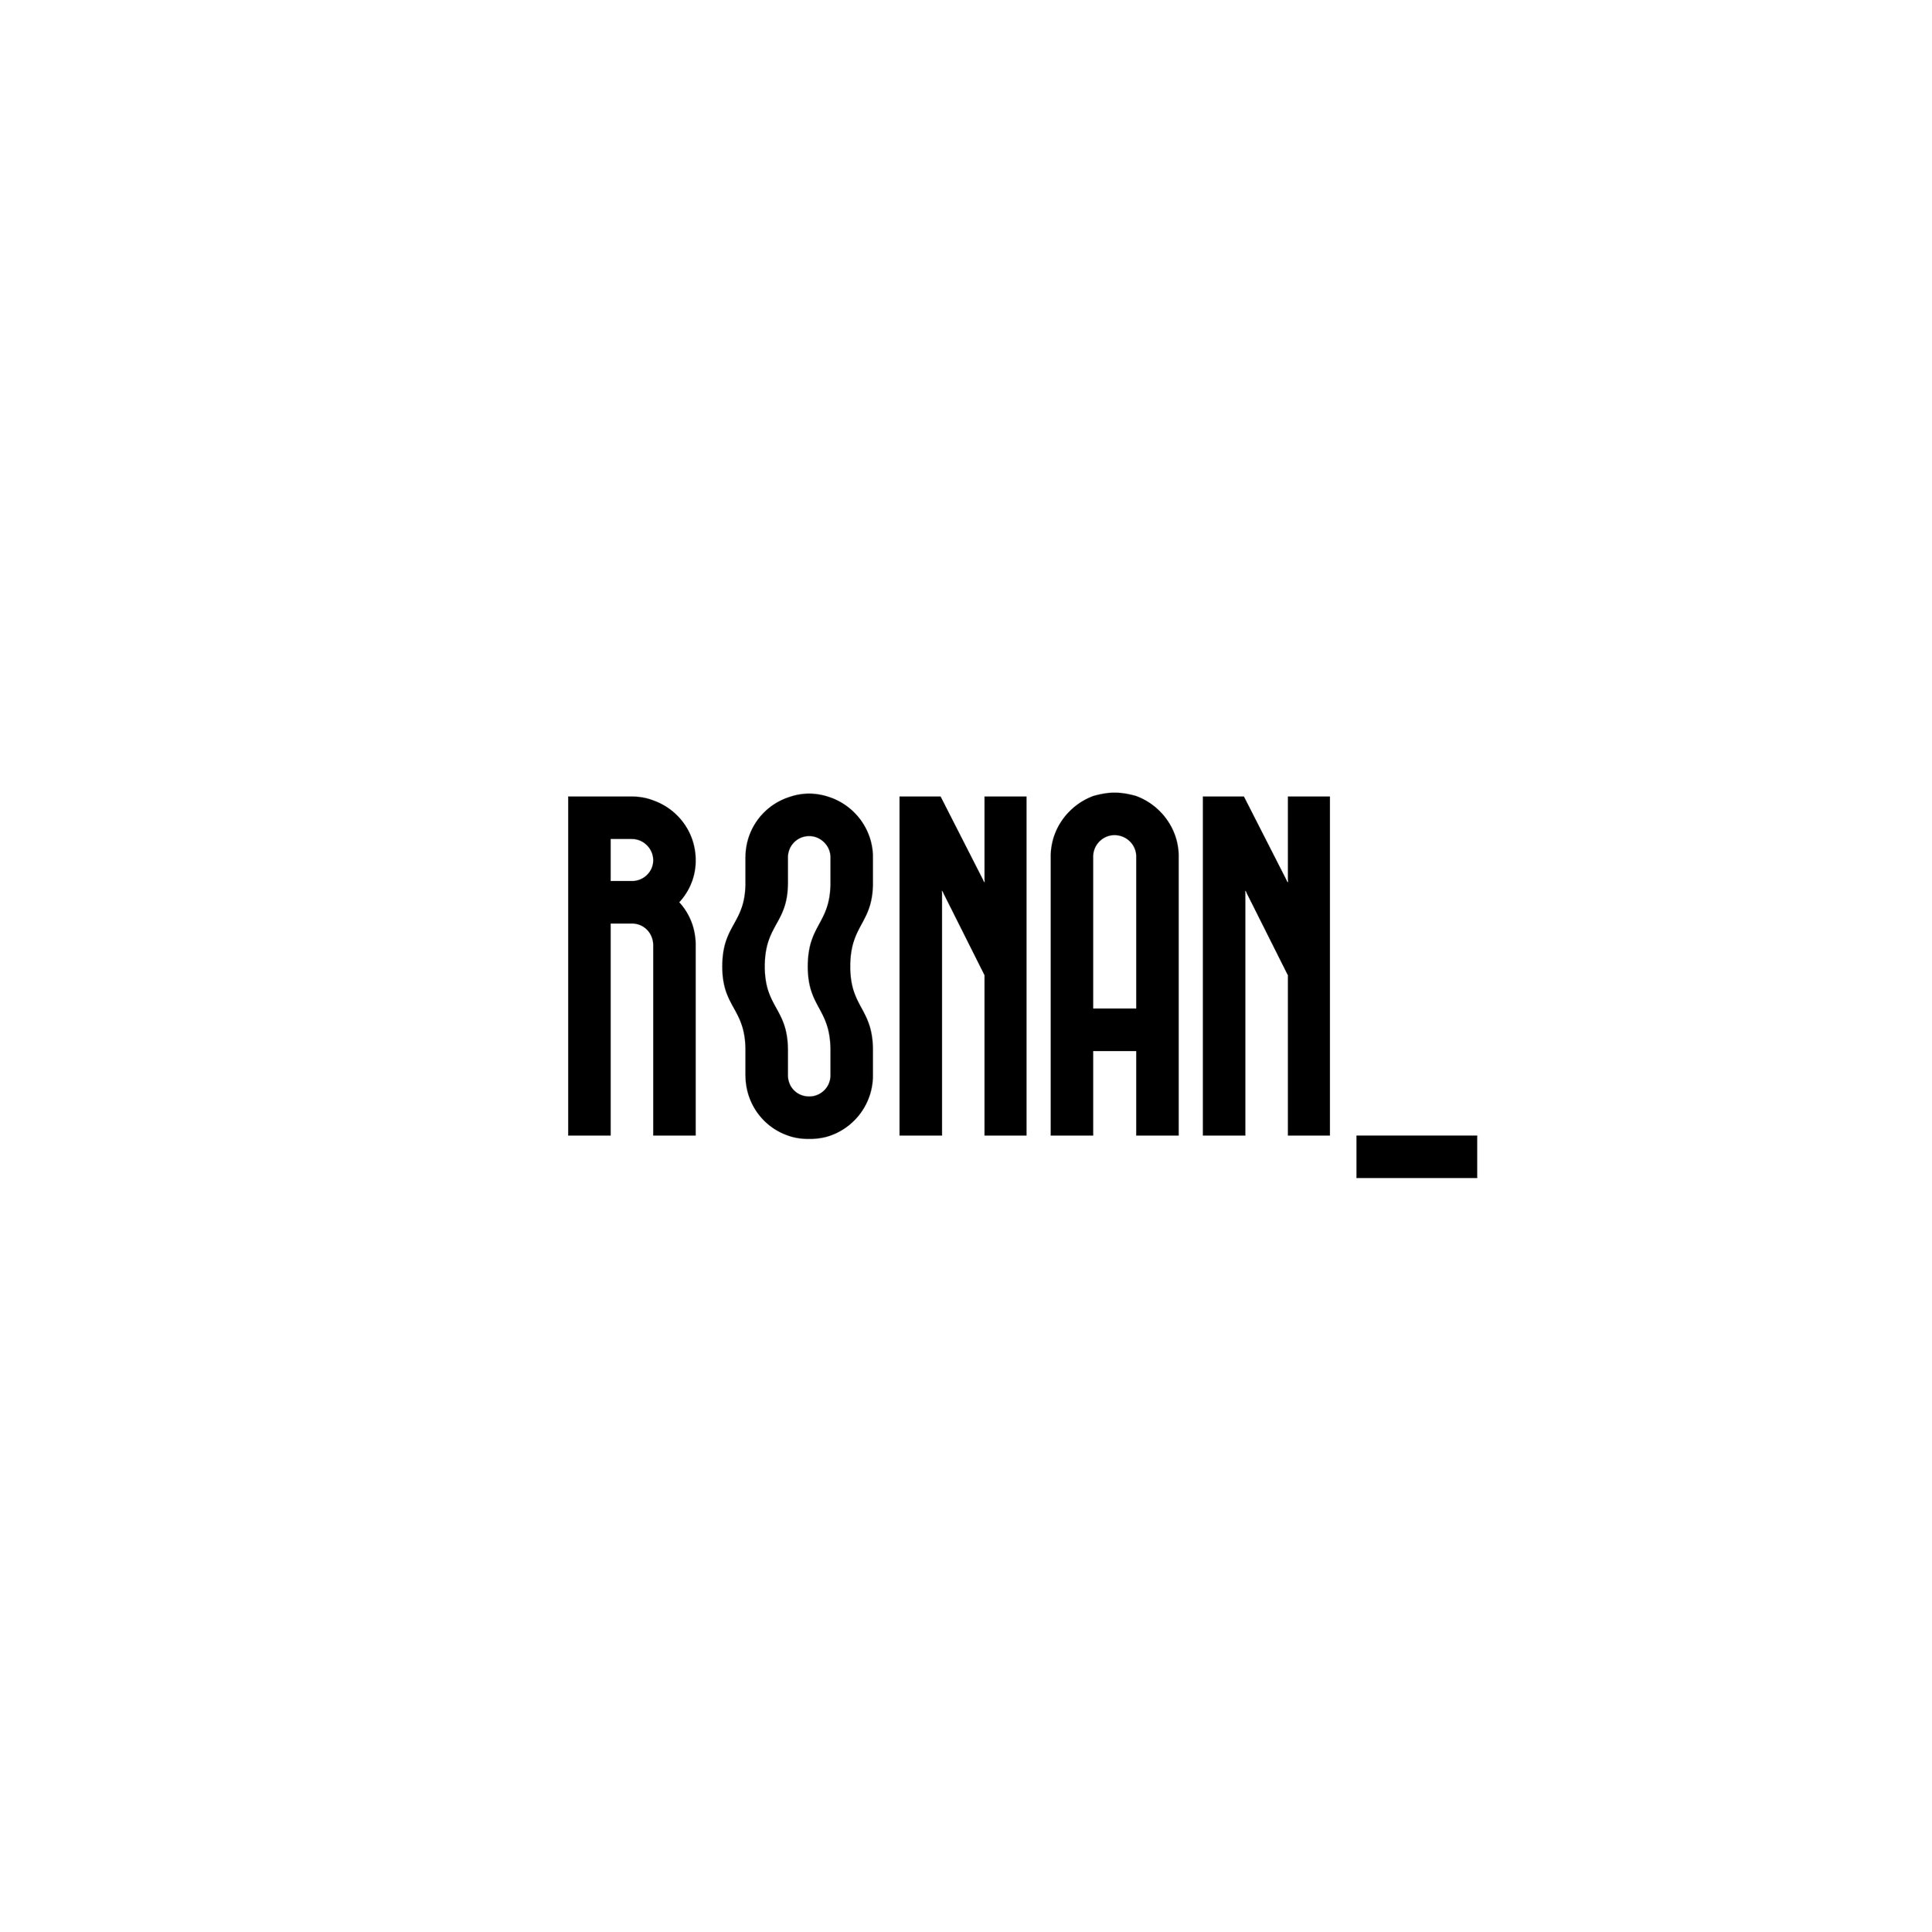 ronan_bardonneau.jpg